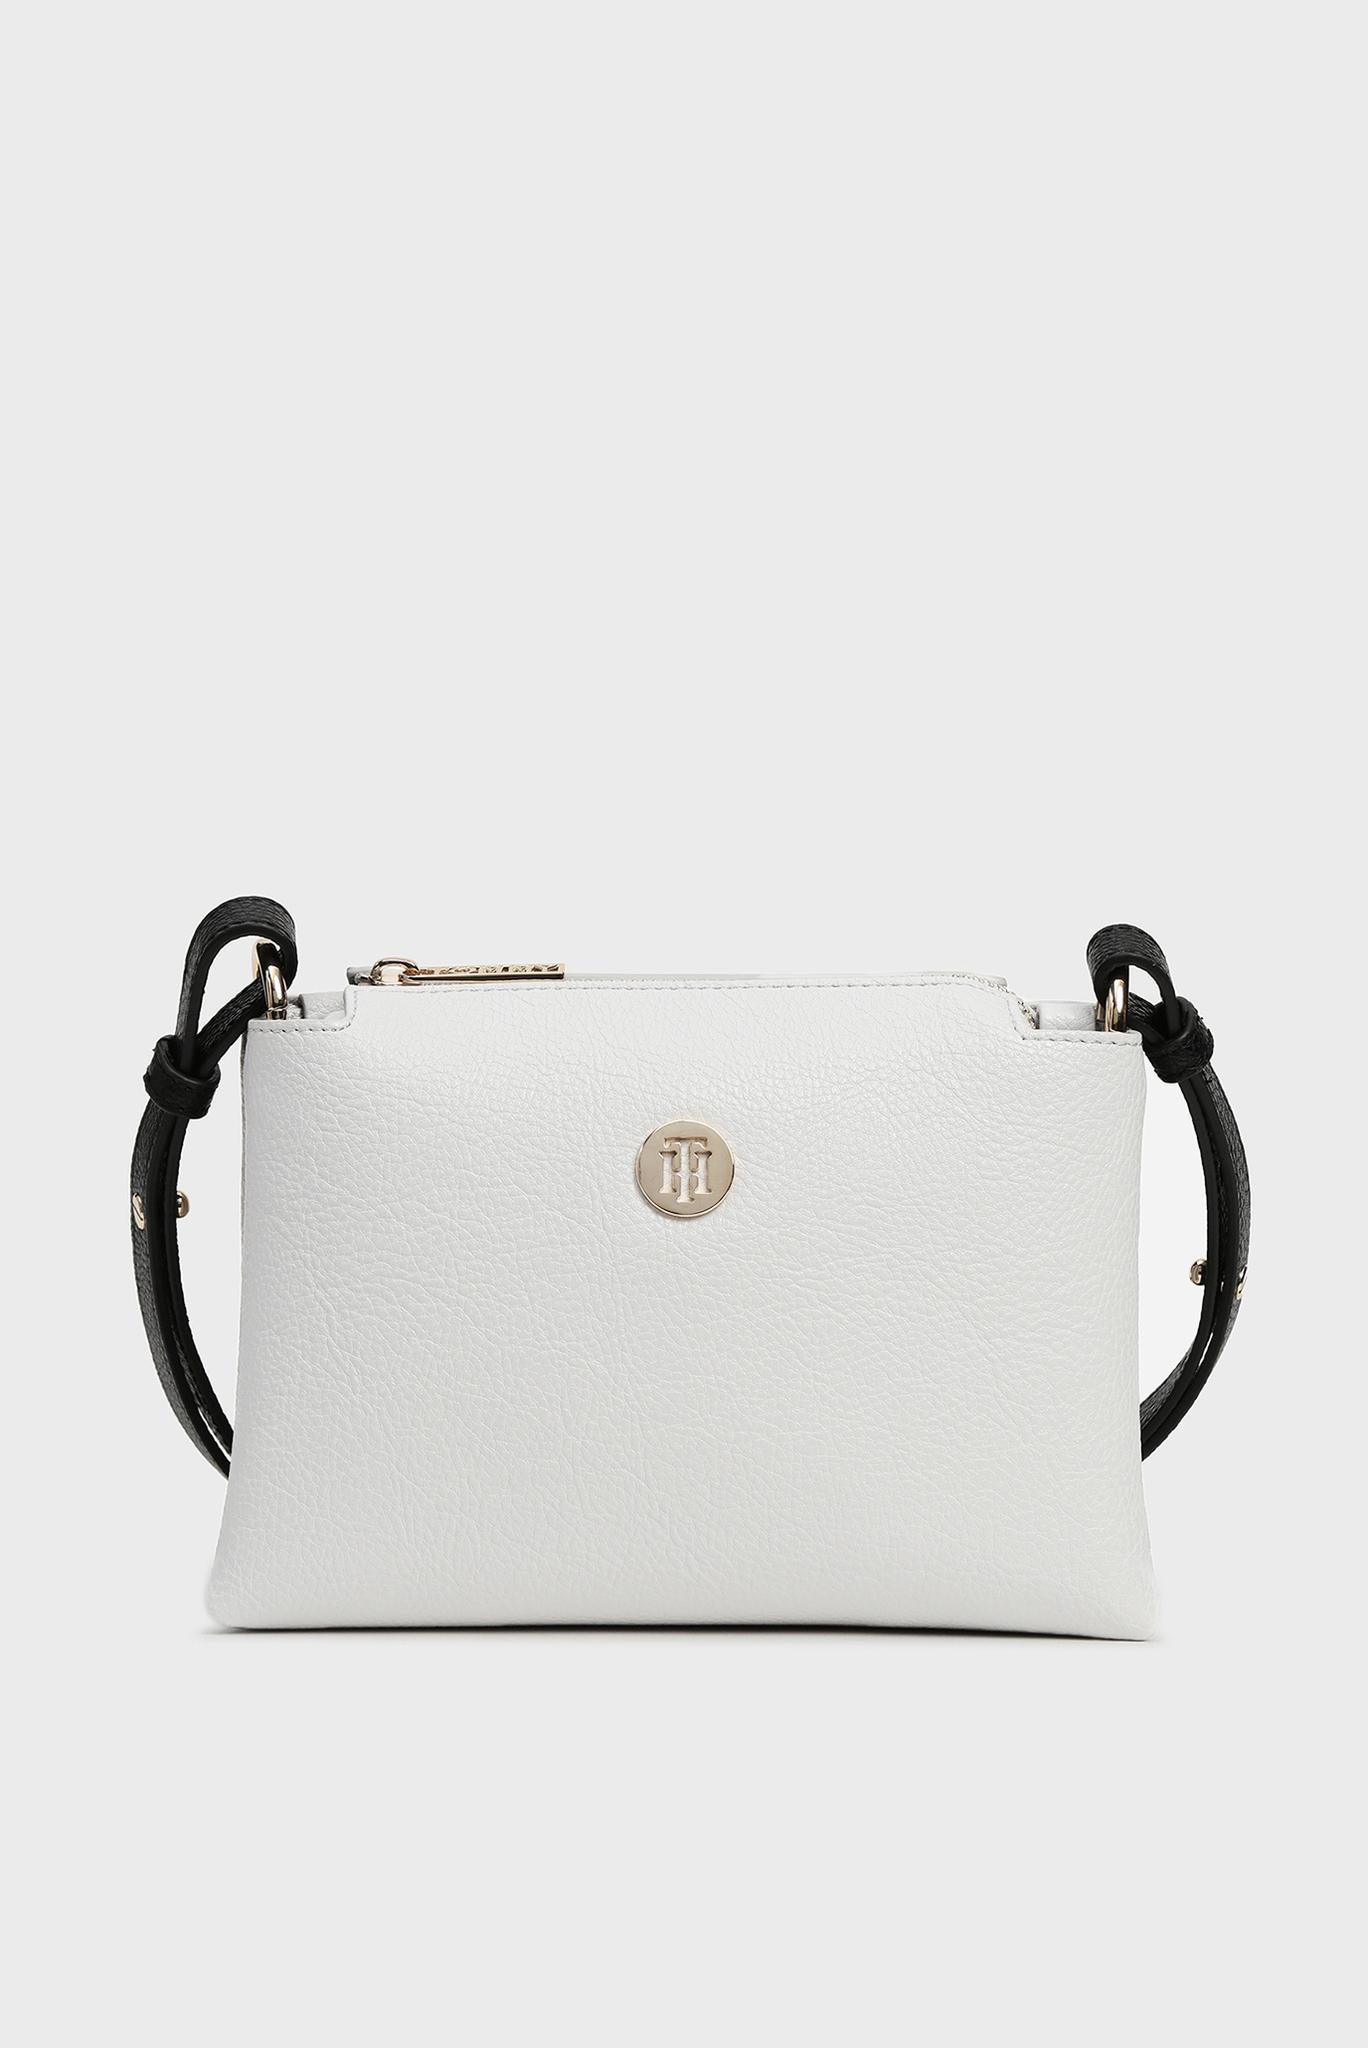 Женская белая сумка через плечо TH CORE Tommy Hilfiger